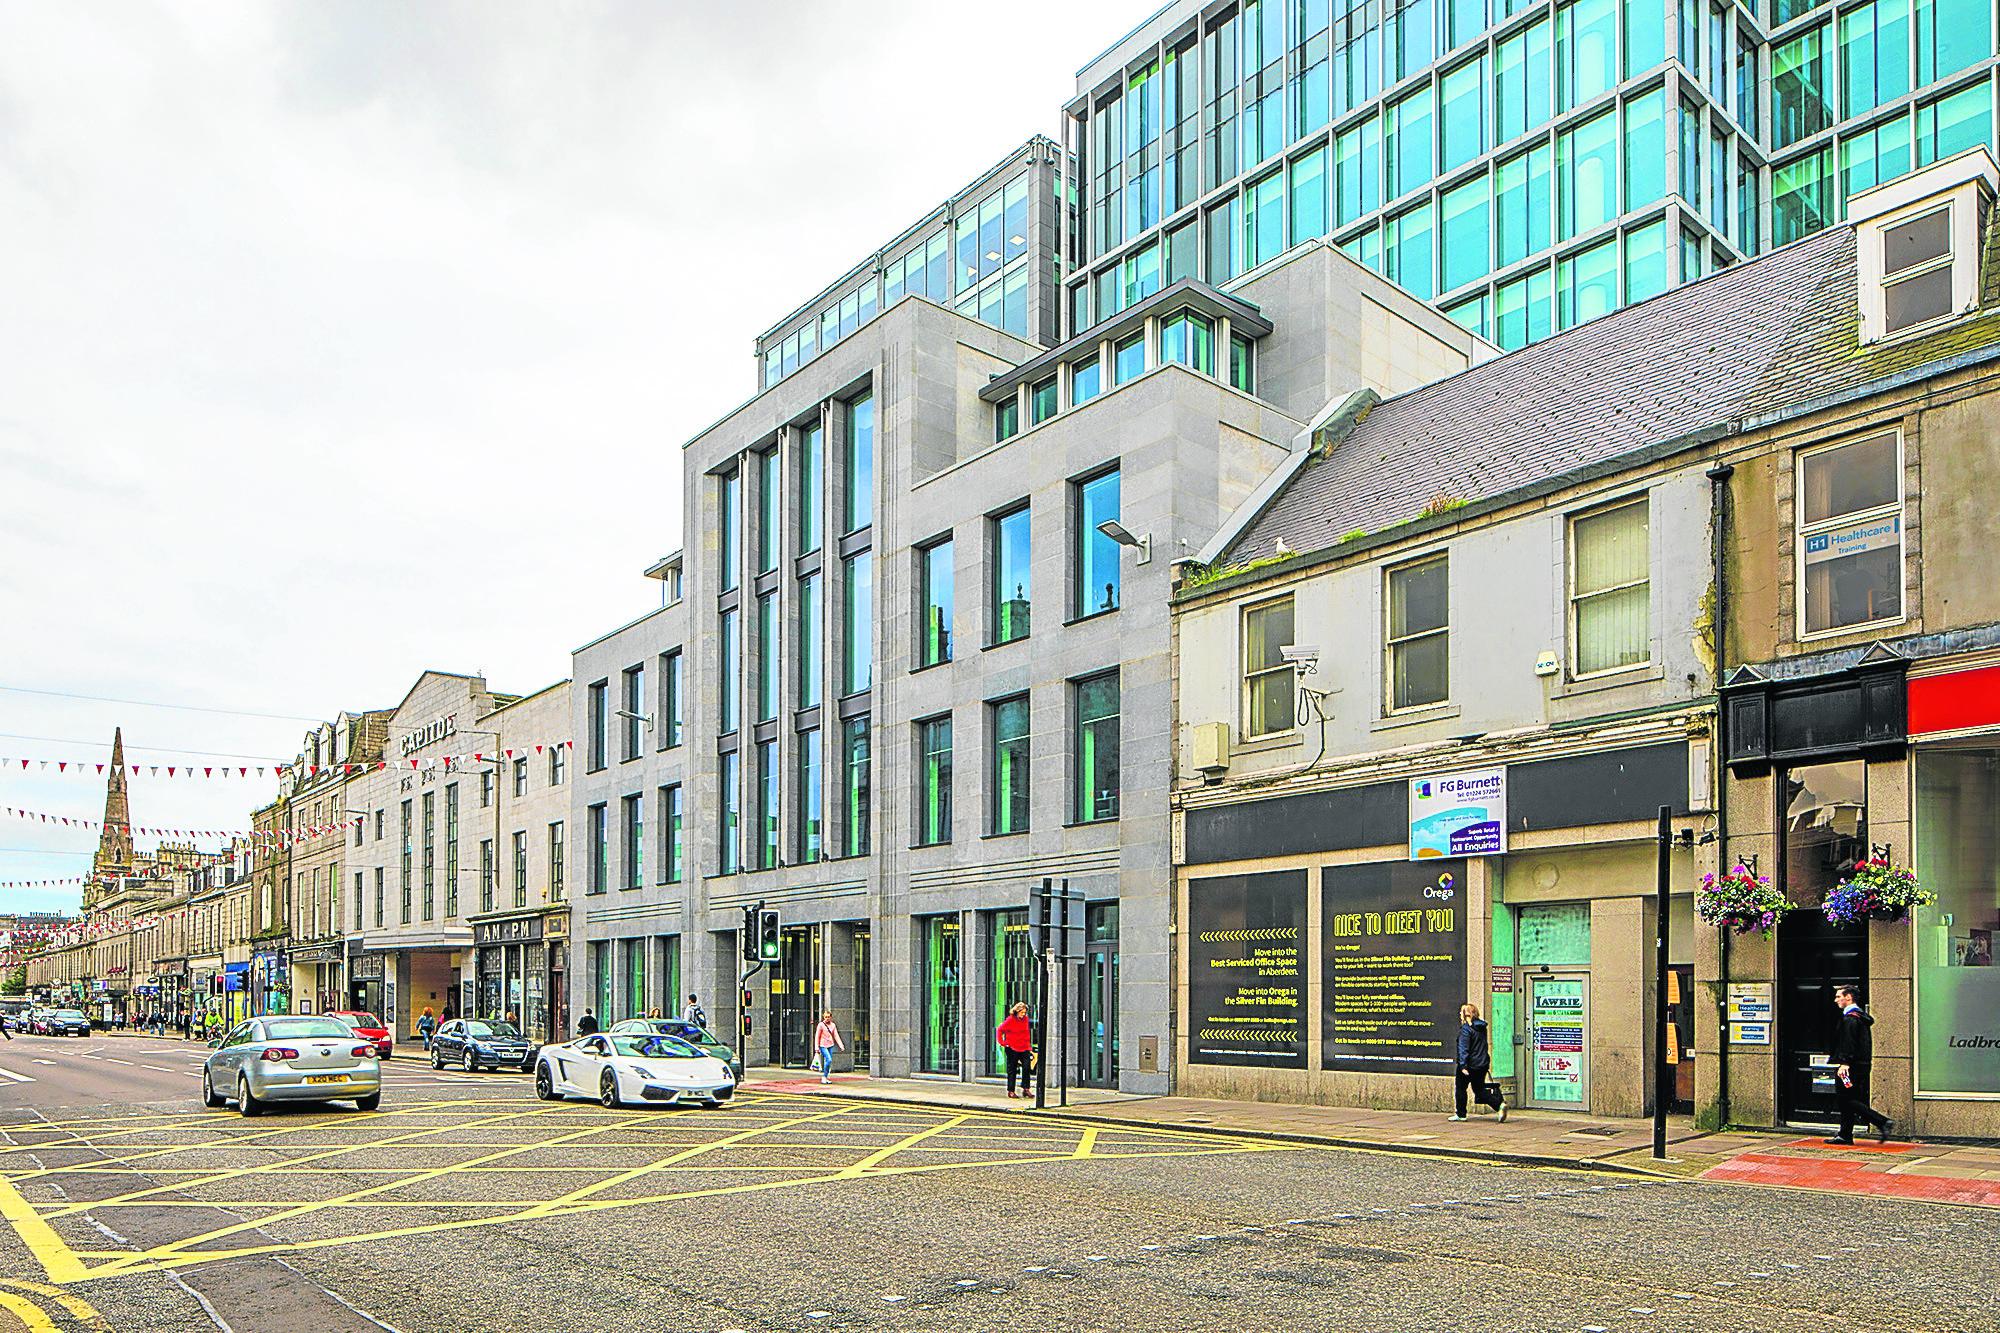 The new Silver Fin office development in Aberdeen